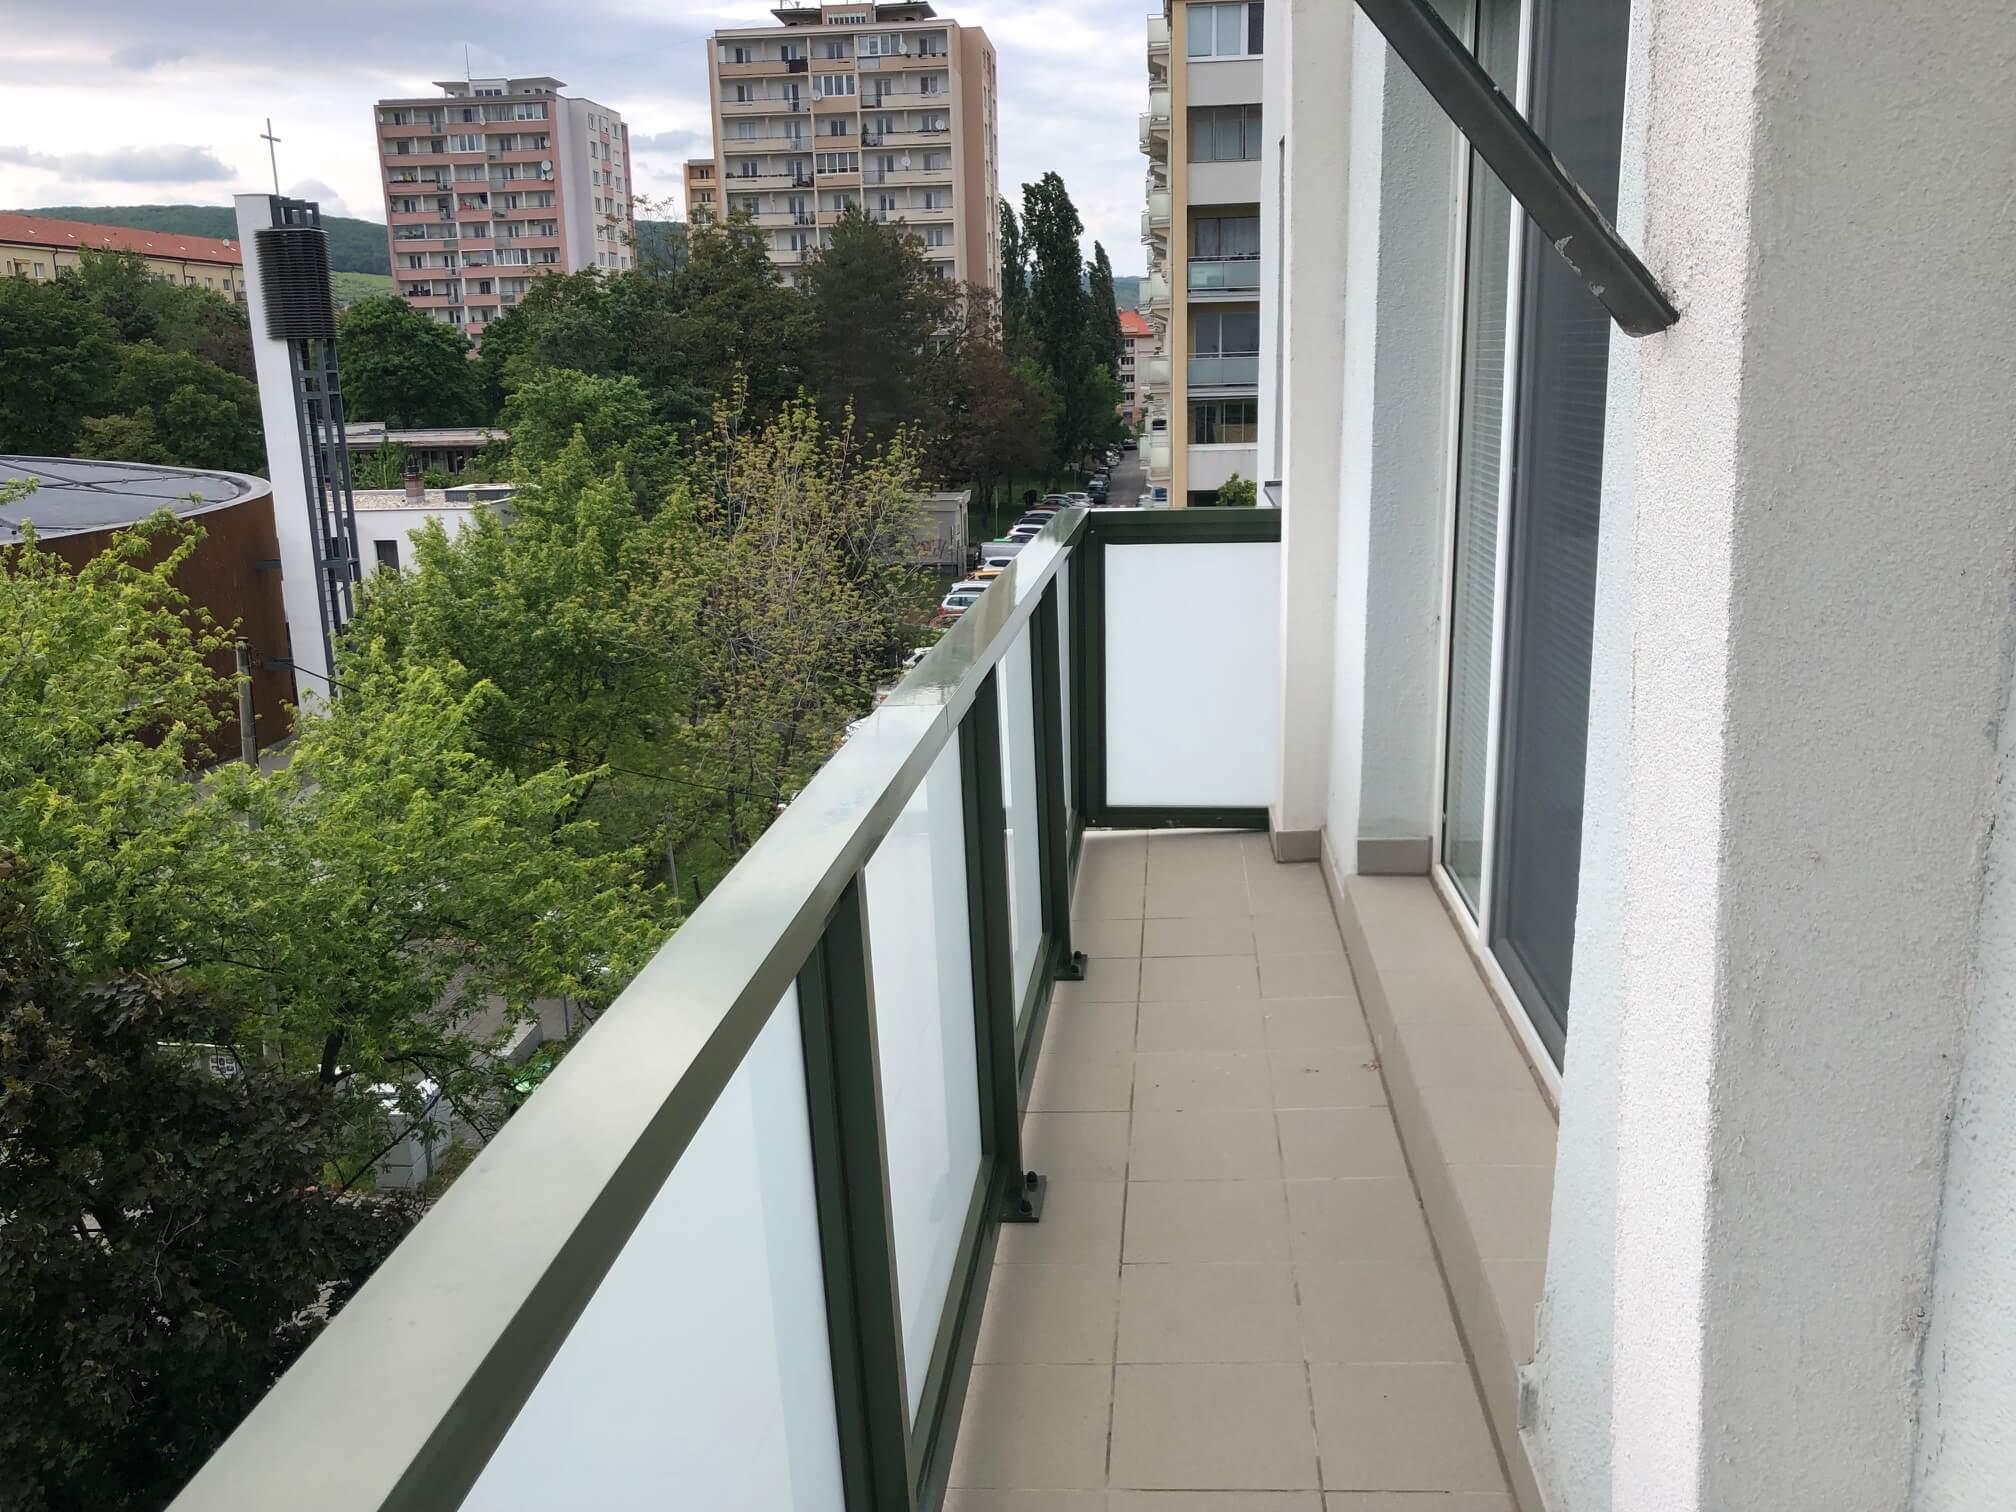 3 izbový byt, Račianska 85, 63m2, balkon 10m2, výborná lokalita-50